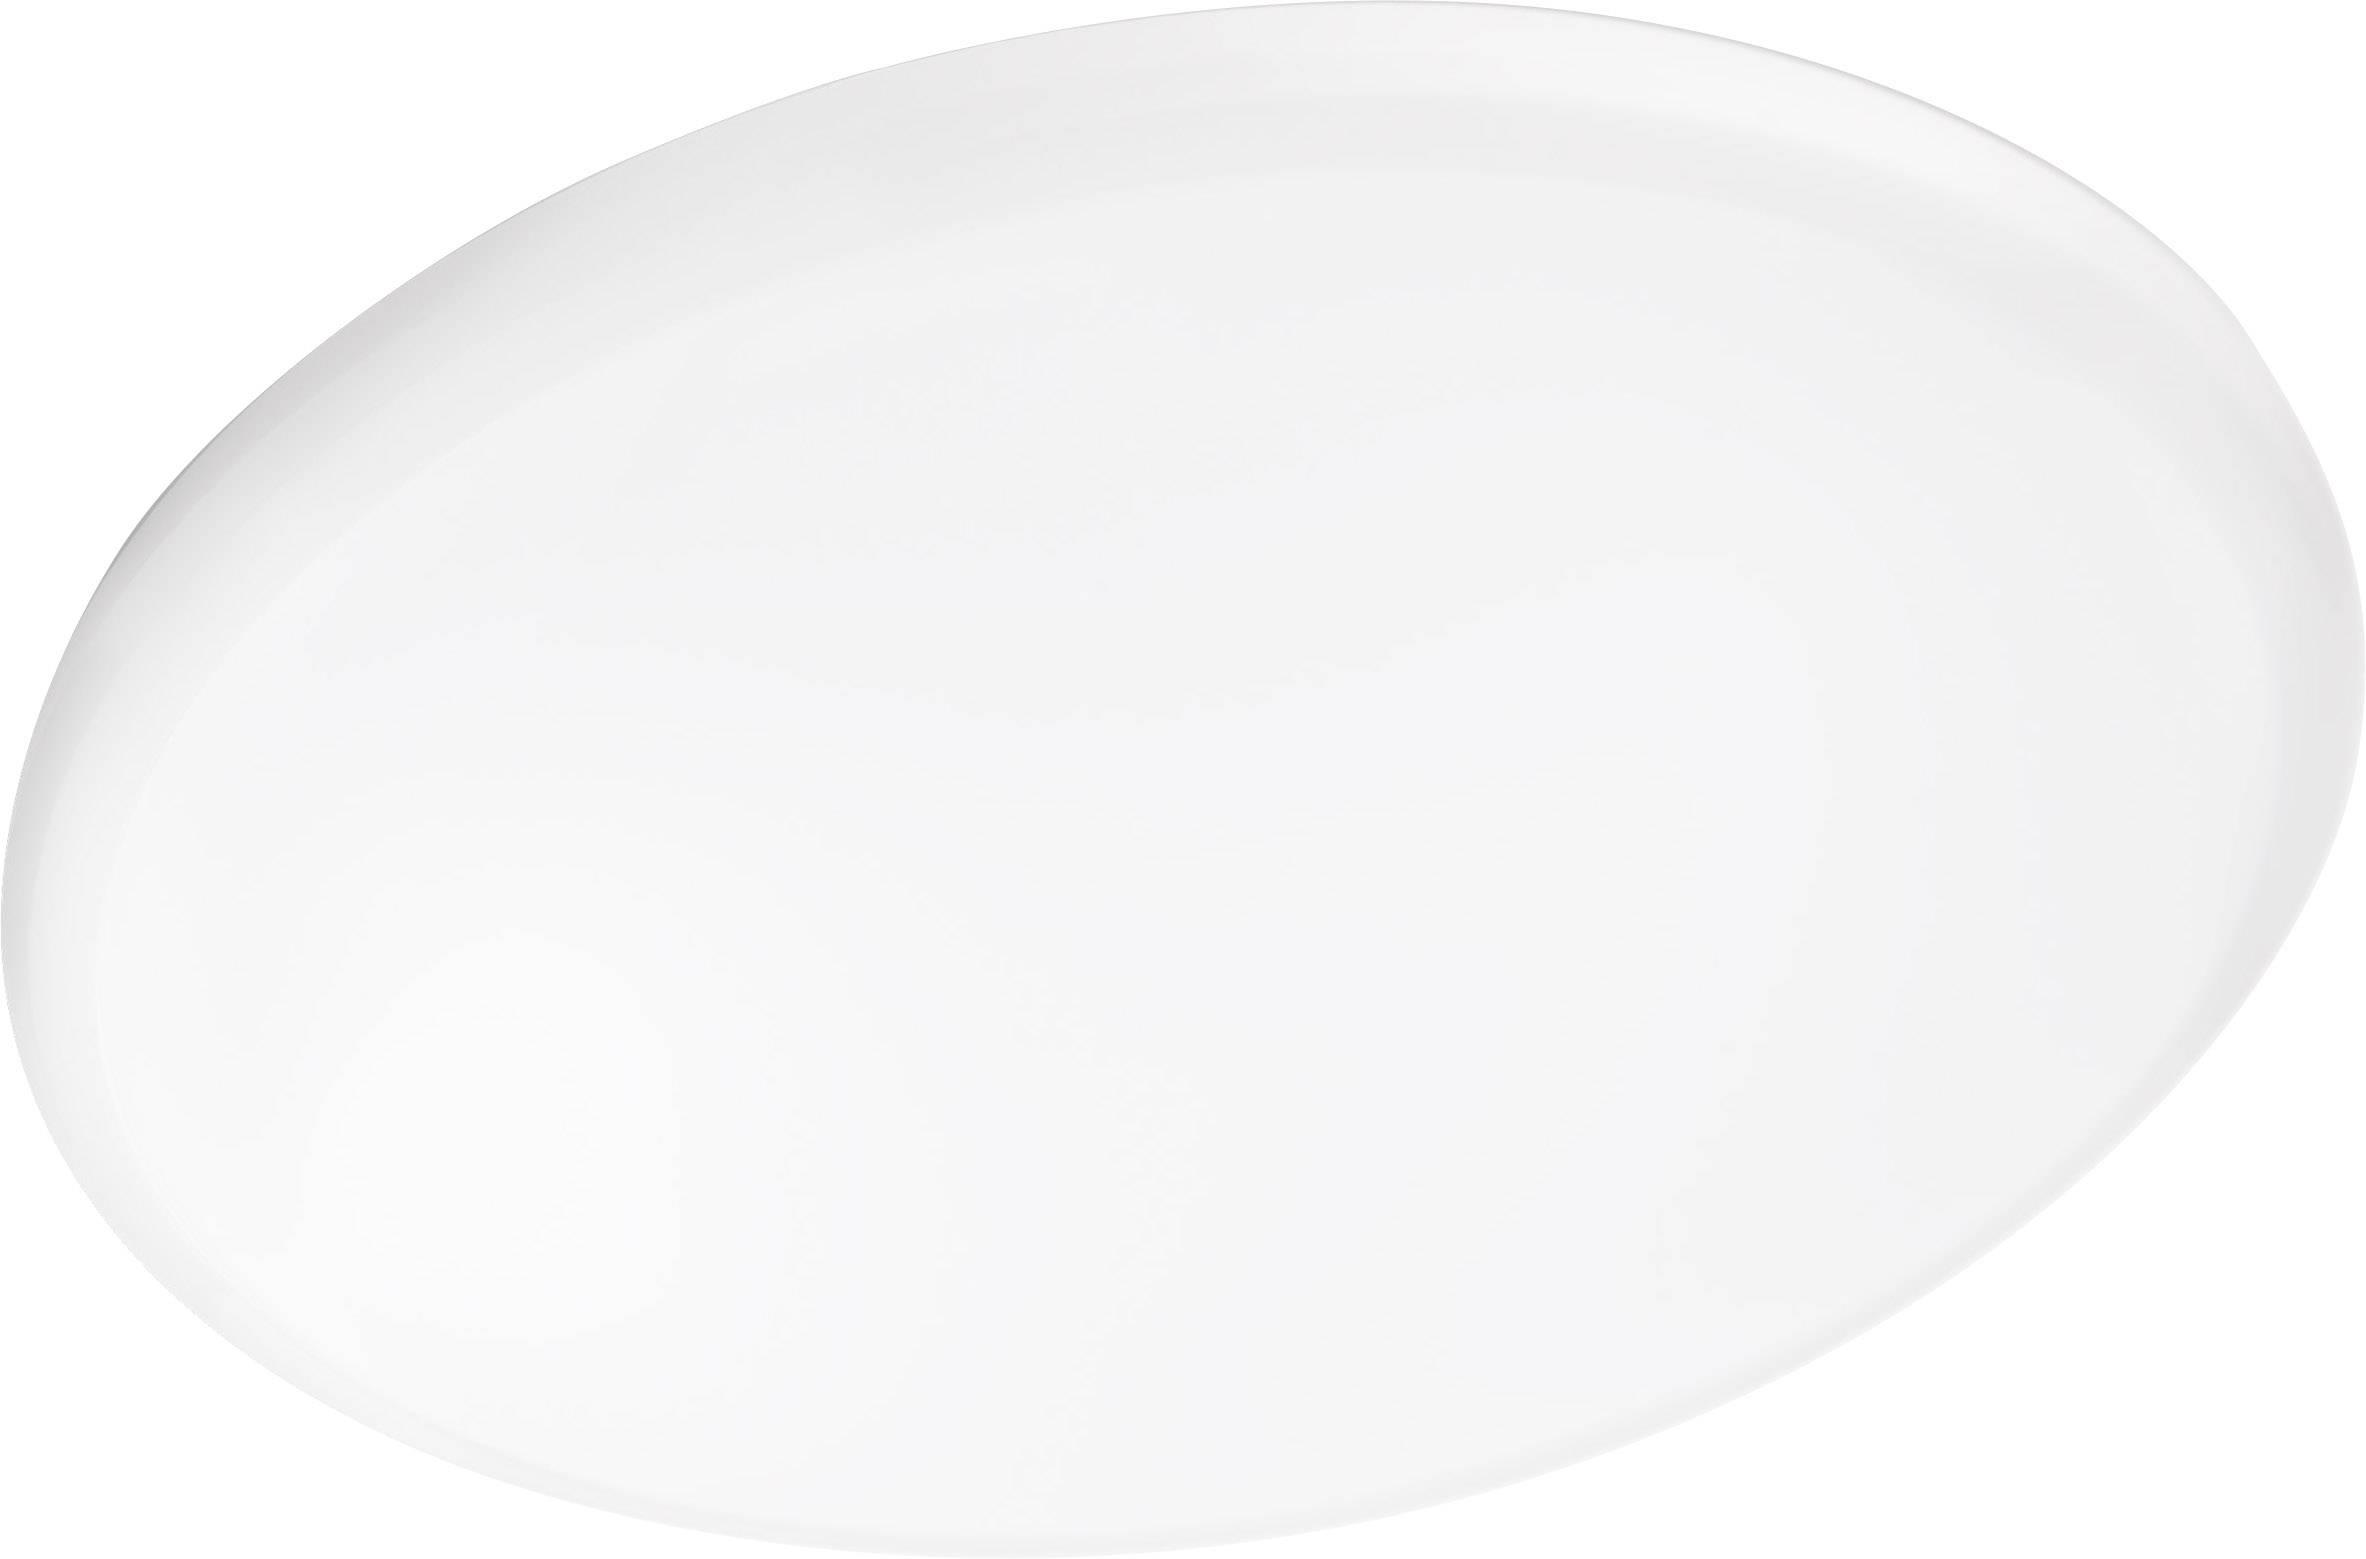 LED stropné svietidlo Philips Lighting Twirly 318153116, 17 W, vonkajší Ø 35 cm, teplá biela, biela